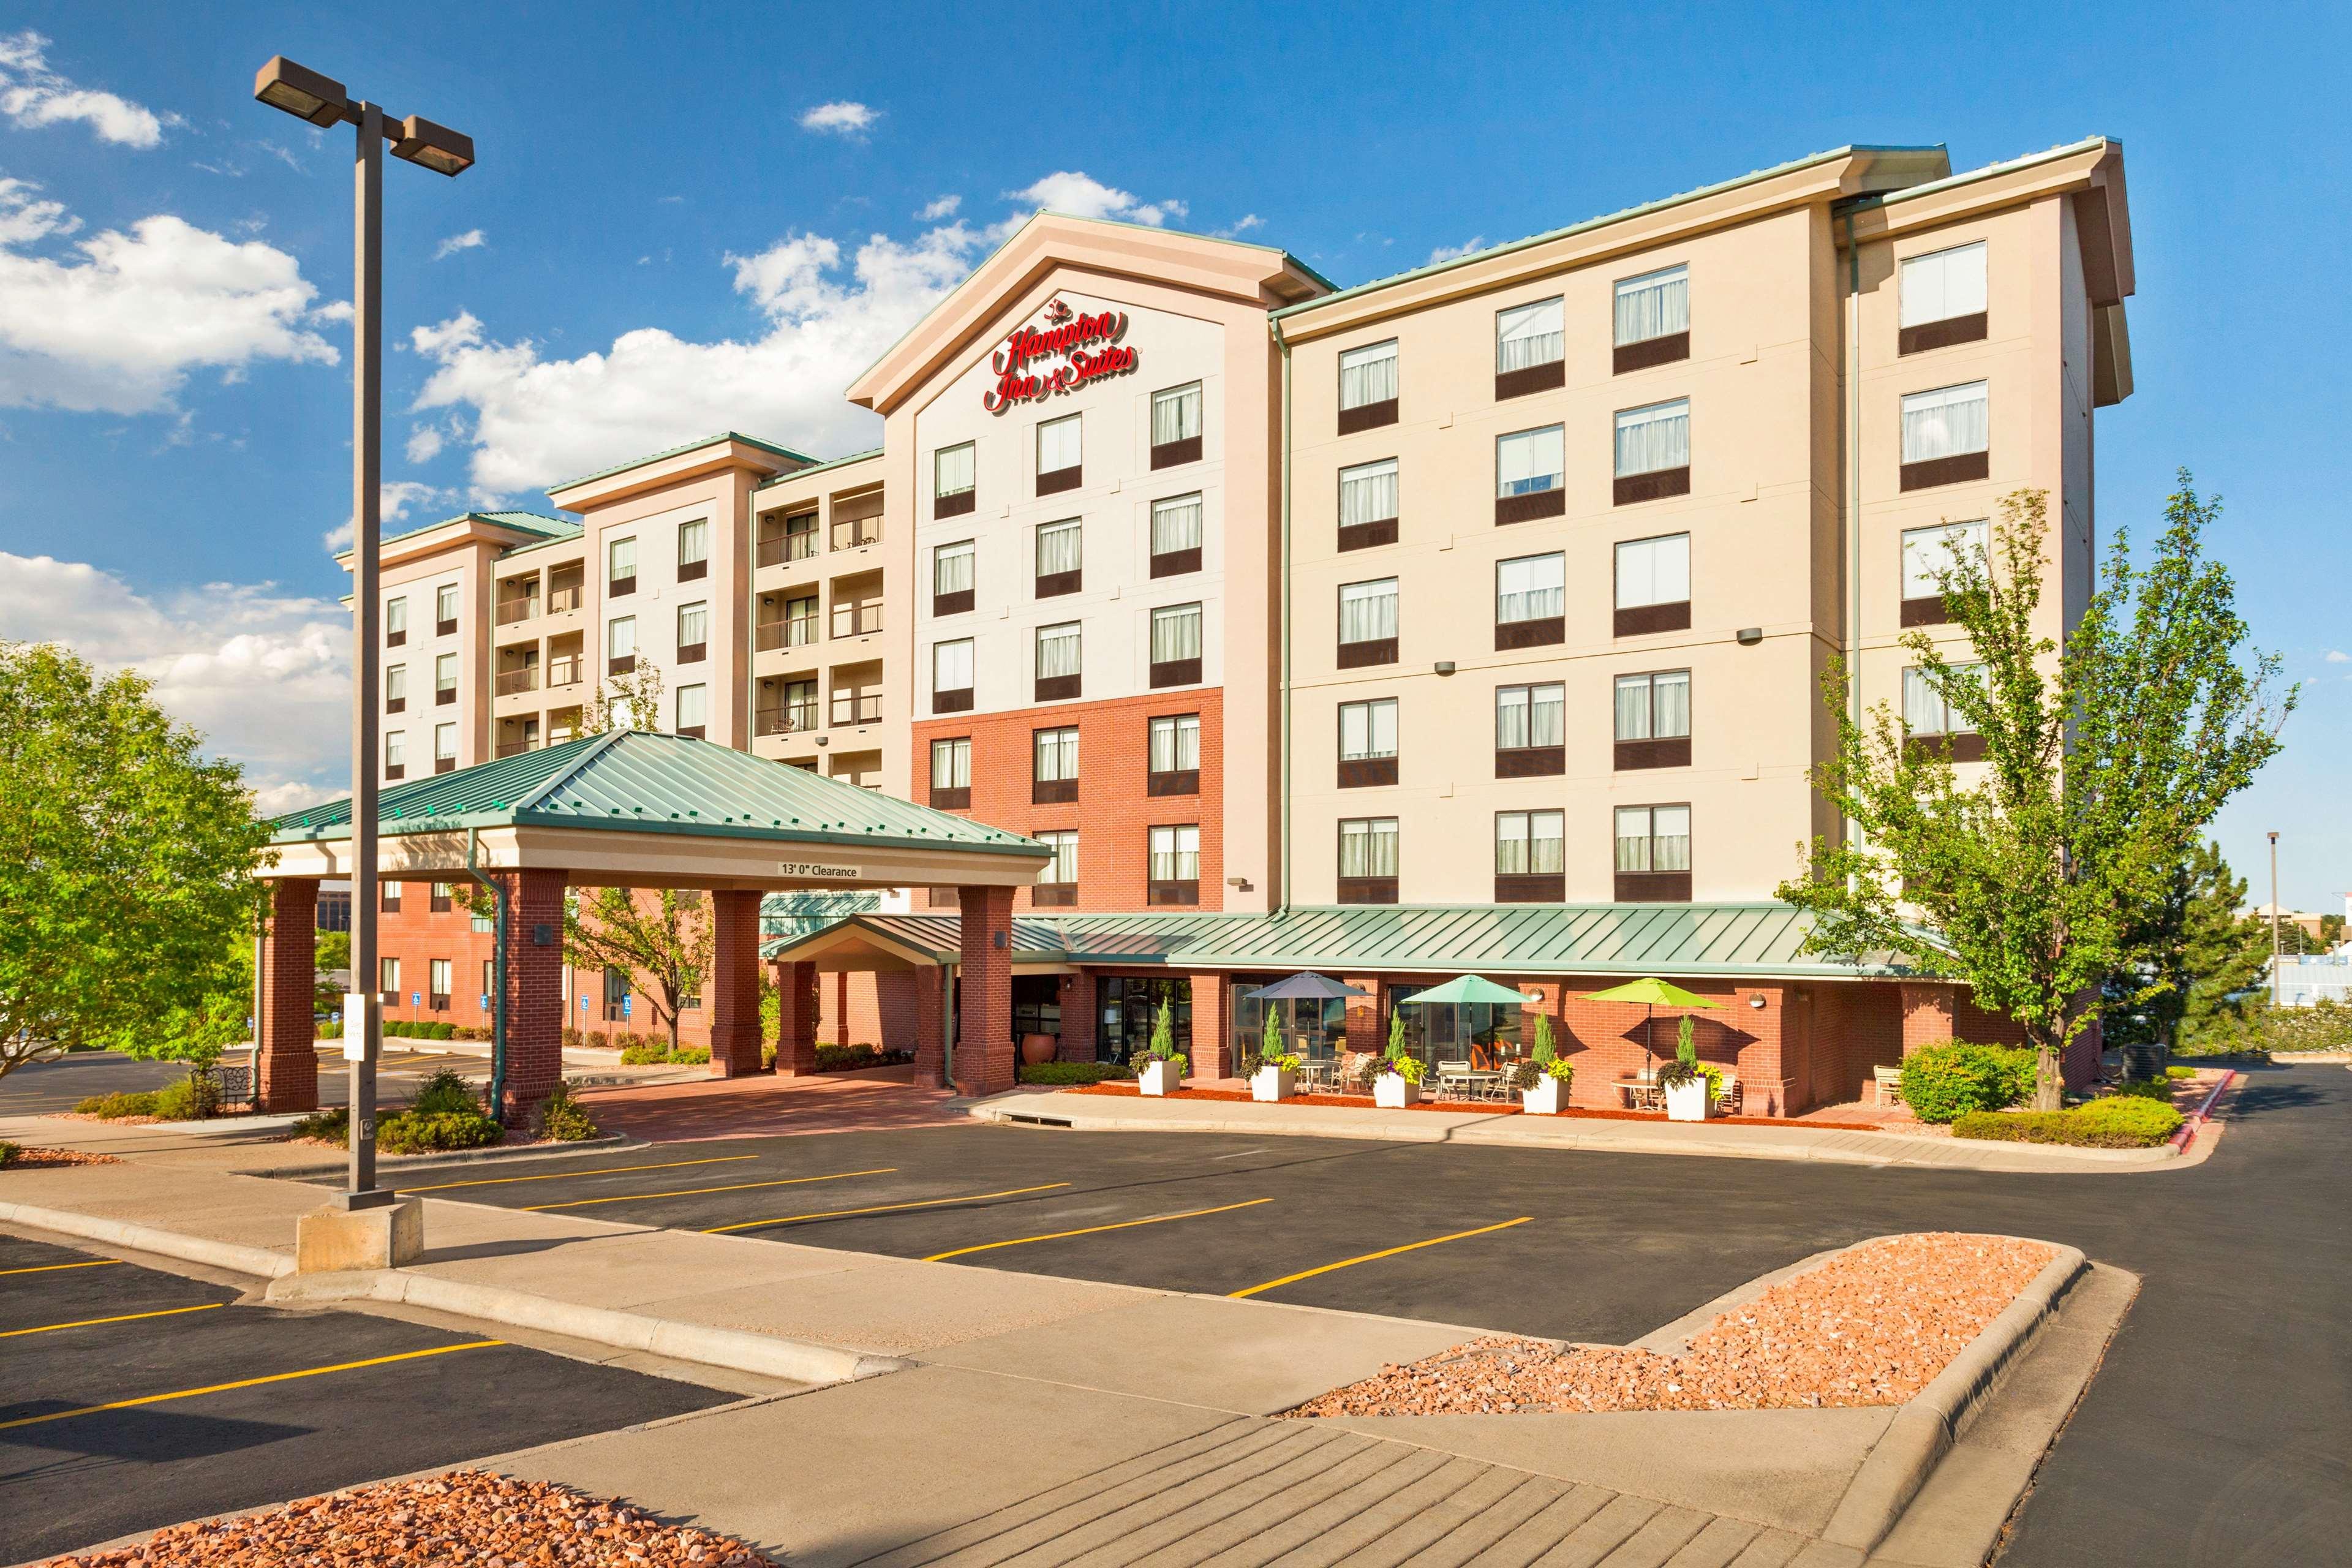 Hampton Inn & Suites Denver-Cherry Creek image 0